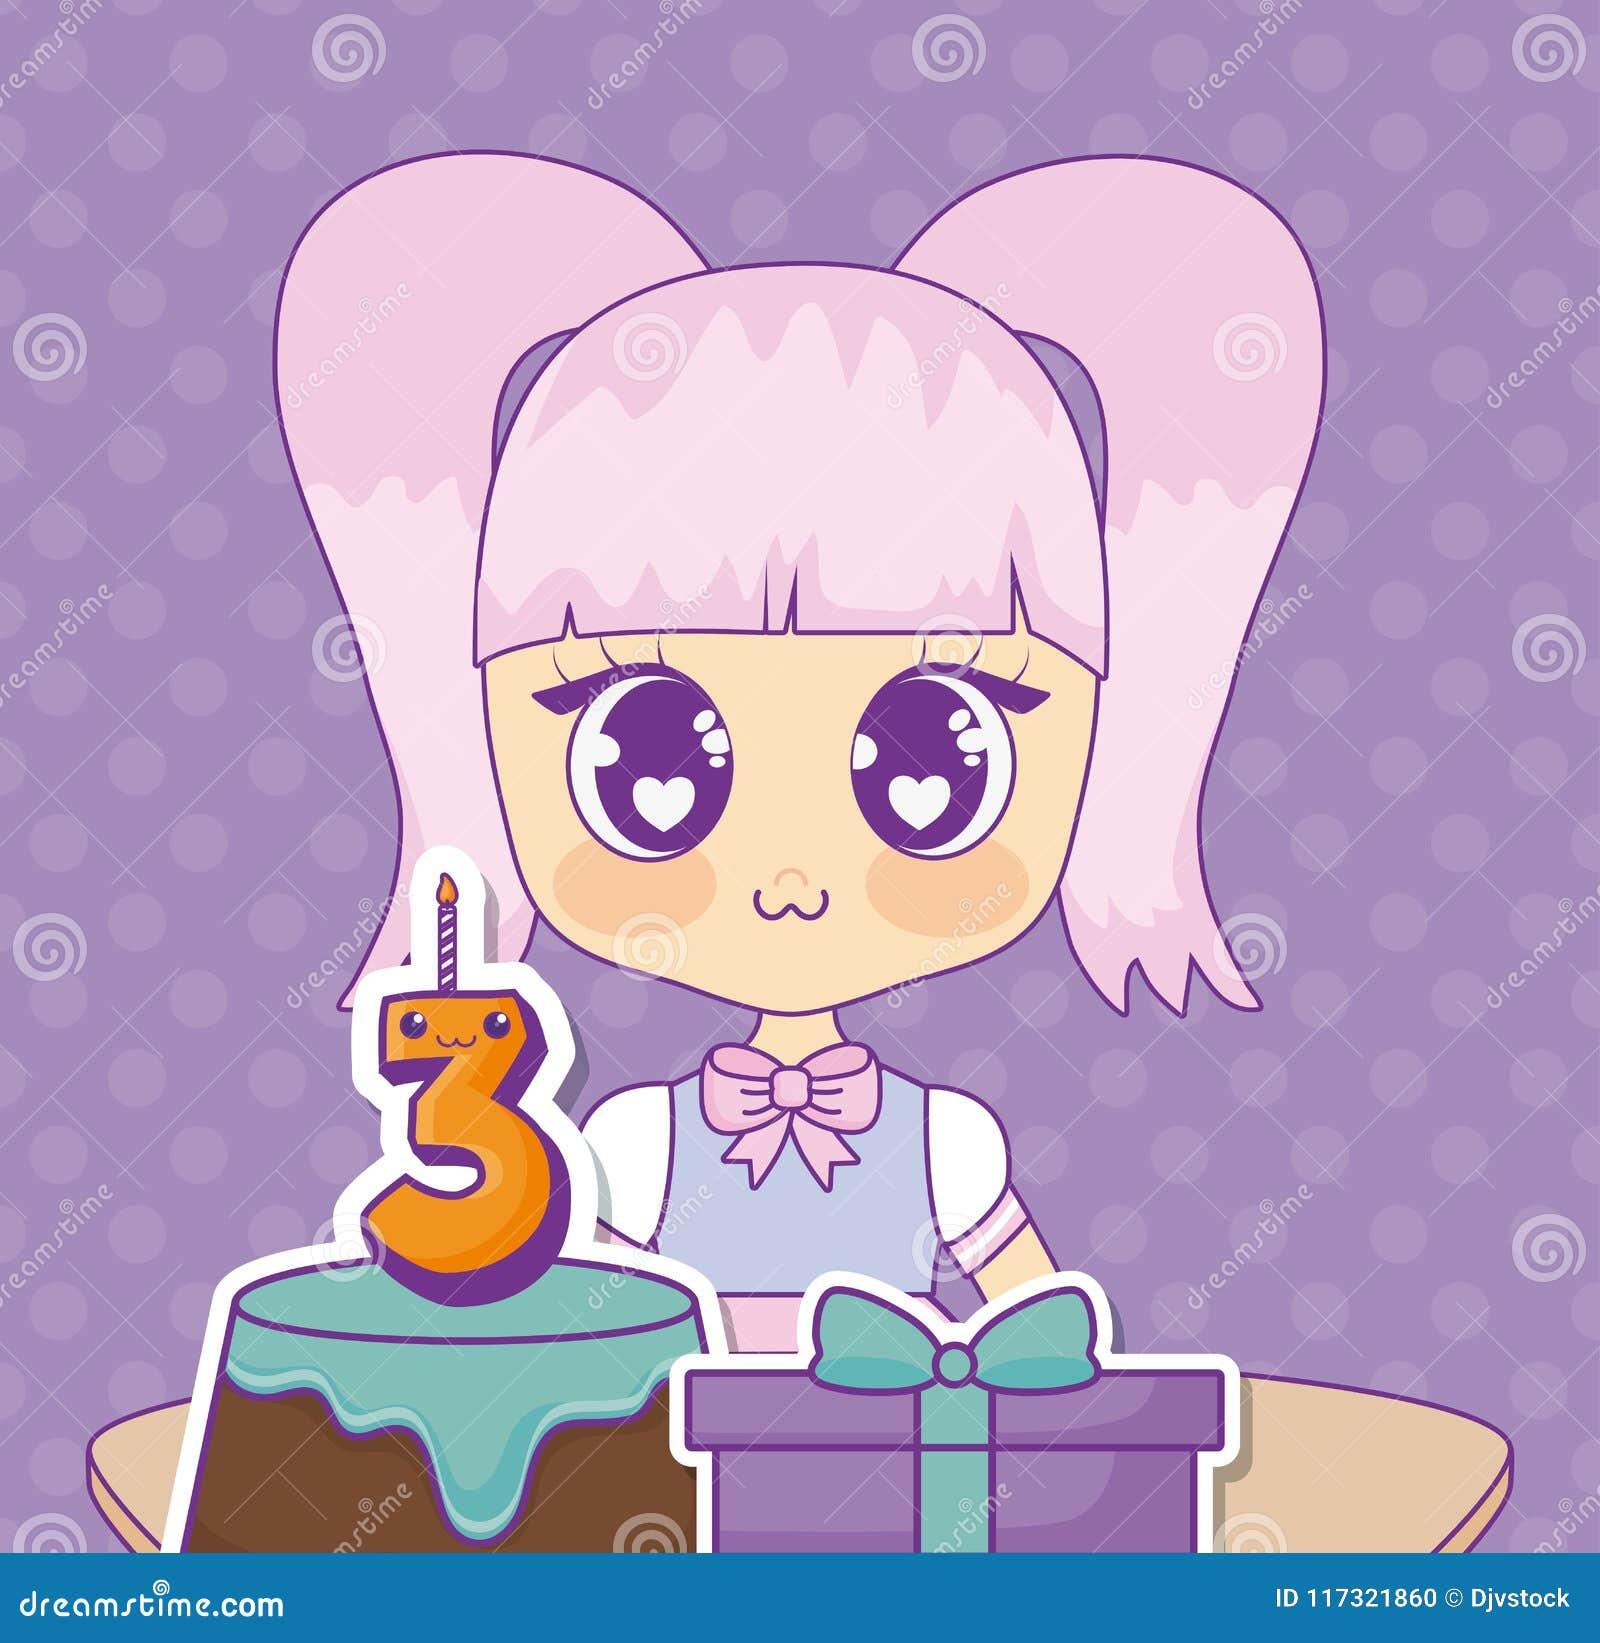 Kawaii Anime Girl Design Stock Vector Illustration Of Card 117321860